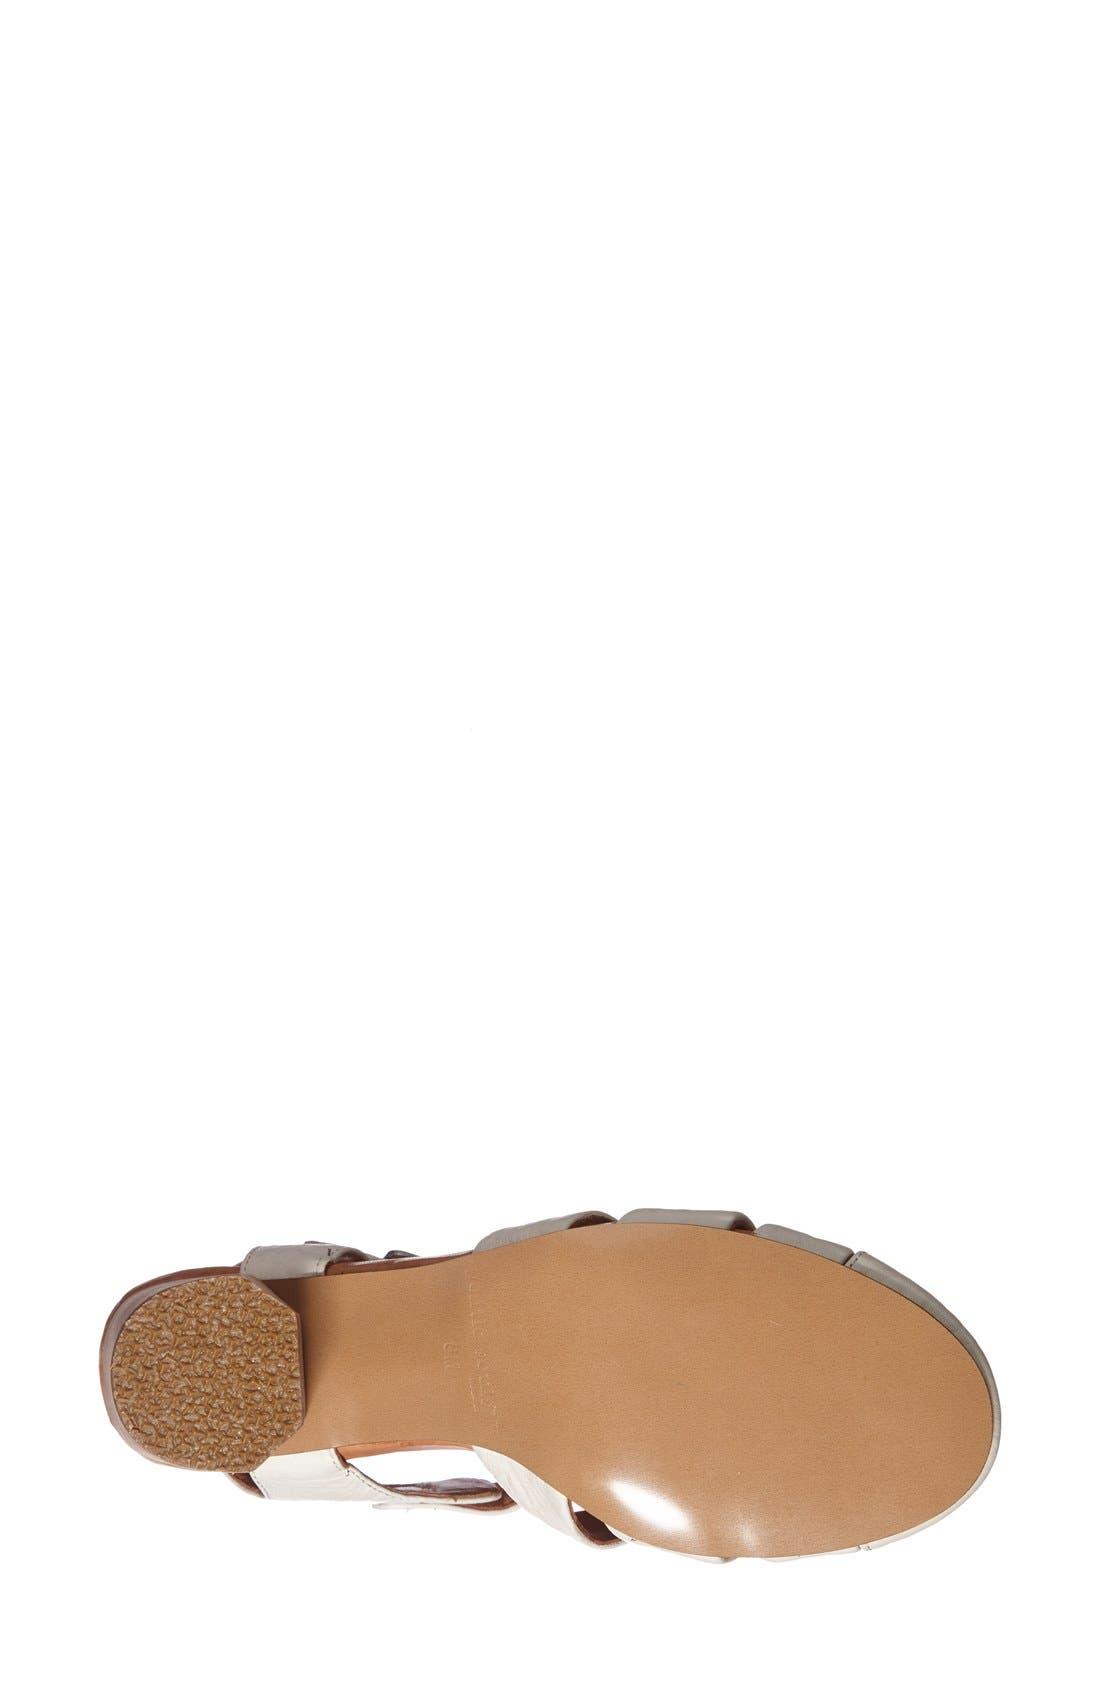 Gentle Souls 'Lucerine' Quarter Strap Closed Toe Leather Sandal,                             Alternate thumbnail 2, color,                             040